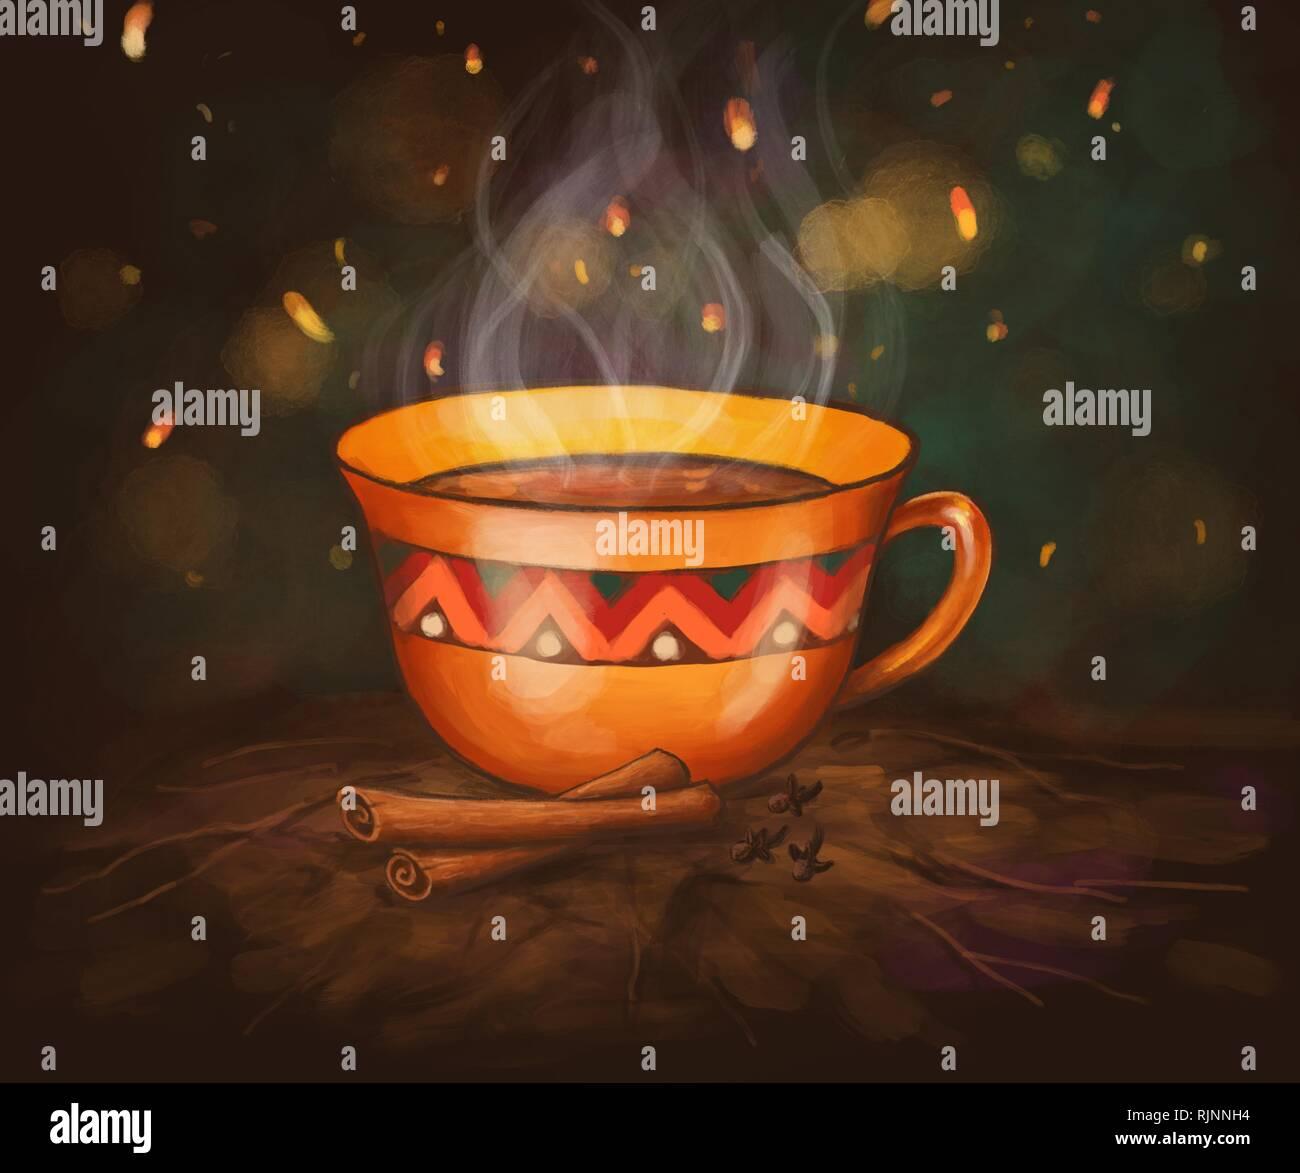 digital illustration of a cup of cinnamon tea Stock Photo